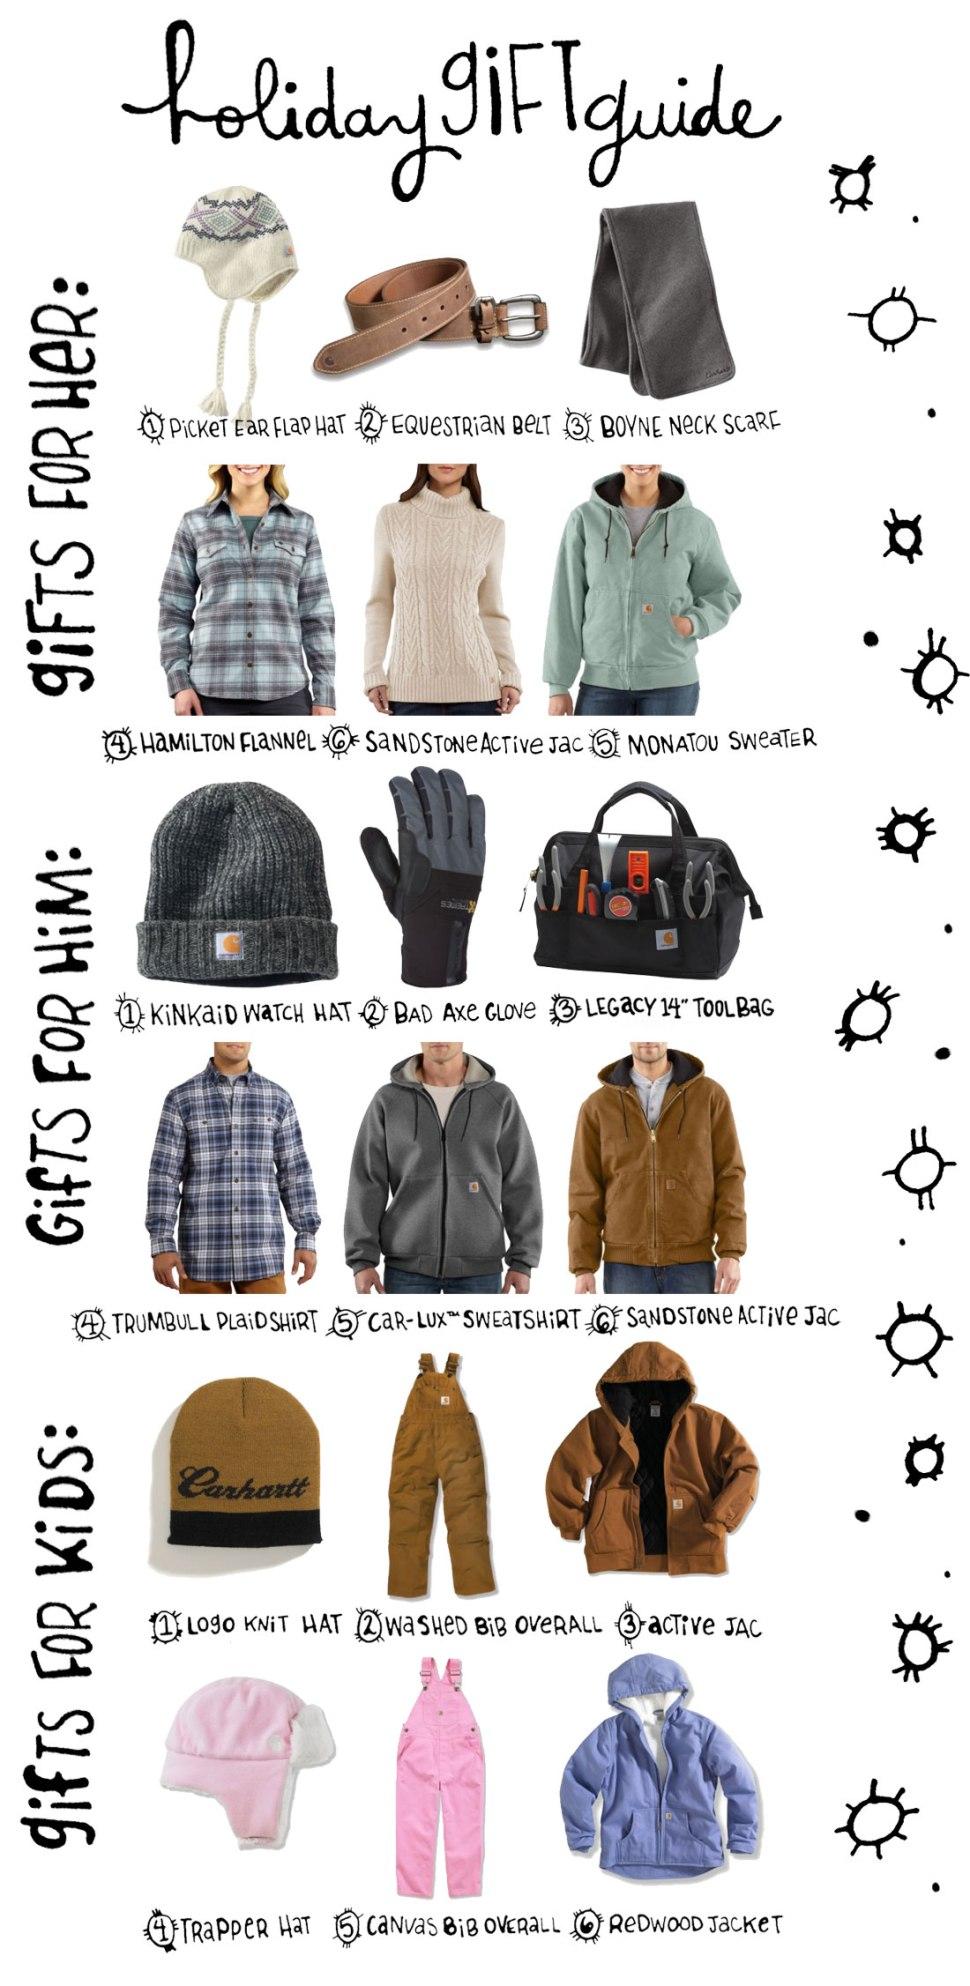 Carhartt Holiday Gift ideas